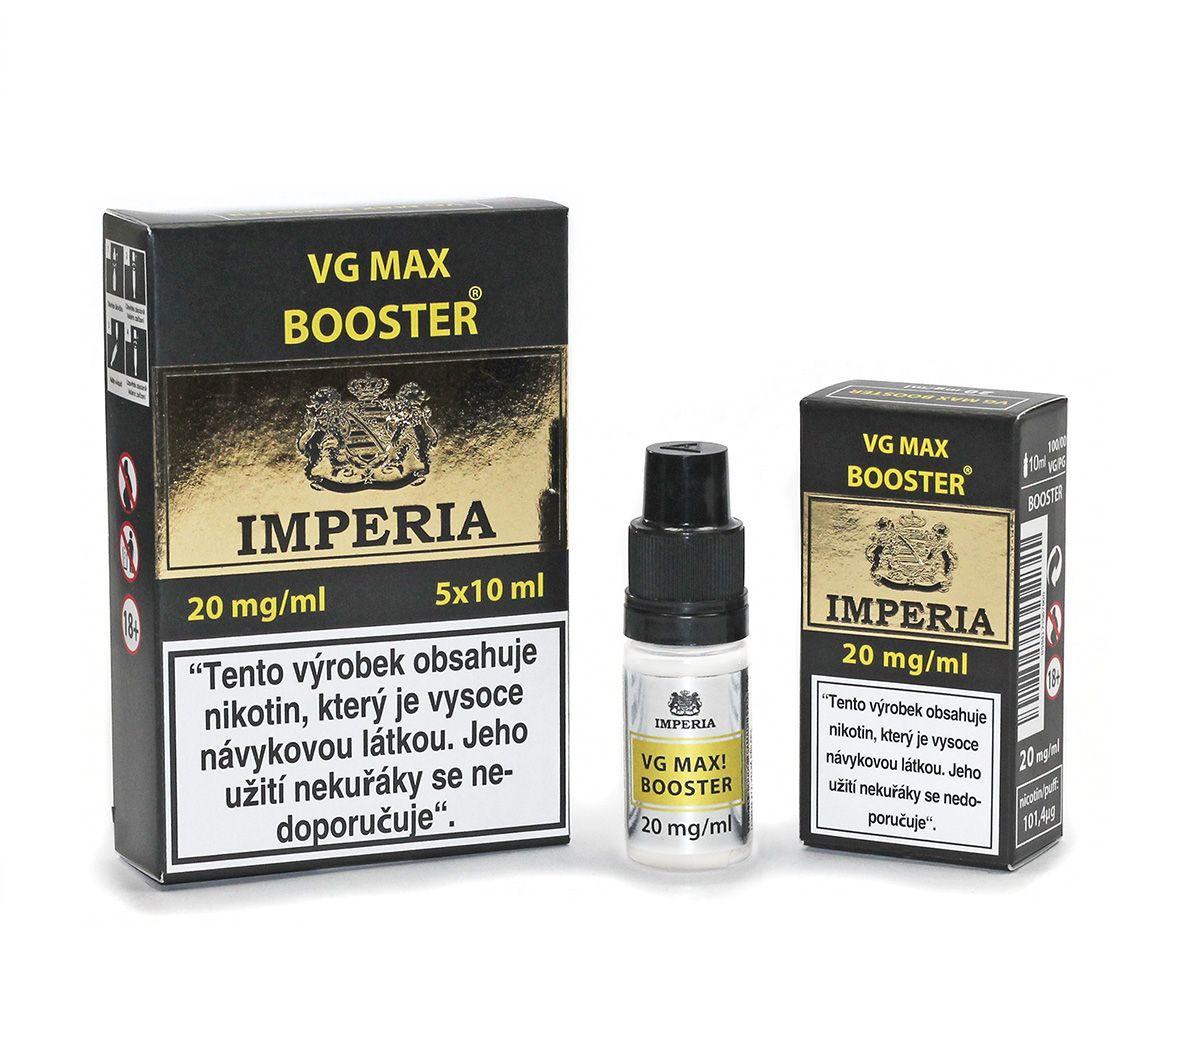 IMPERIA VG max Booster 20mg - 5x10ml (VG100%) Boudoir Samadhi s.r.o.